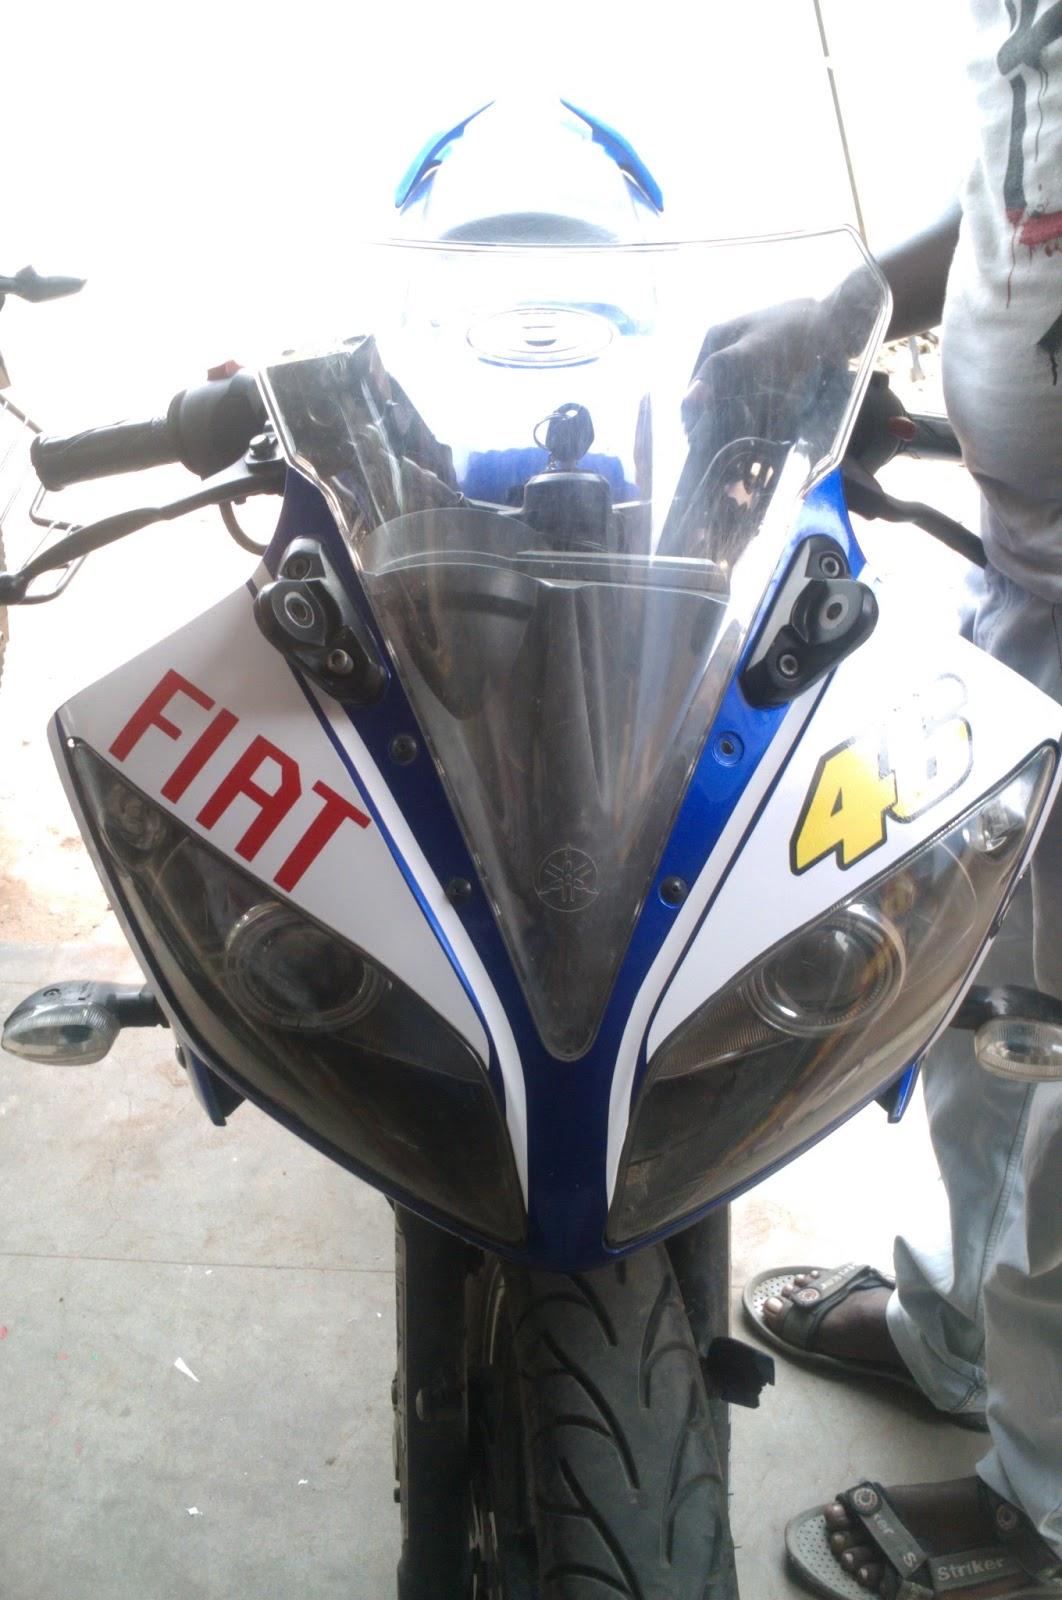 helmet stickering in bangalore dating